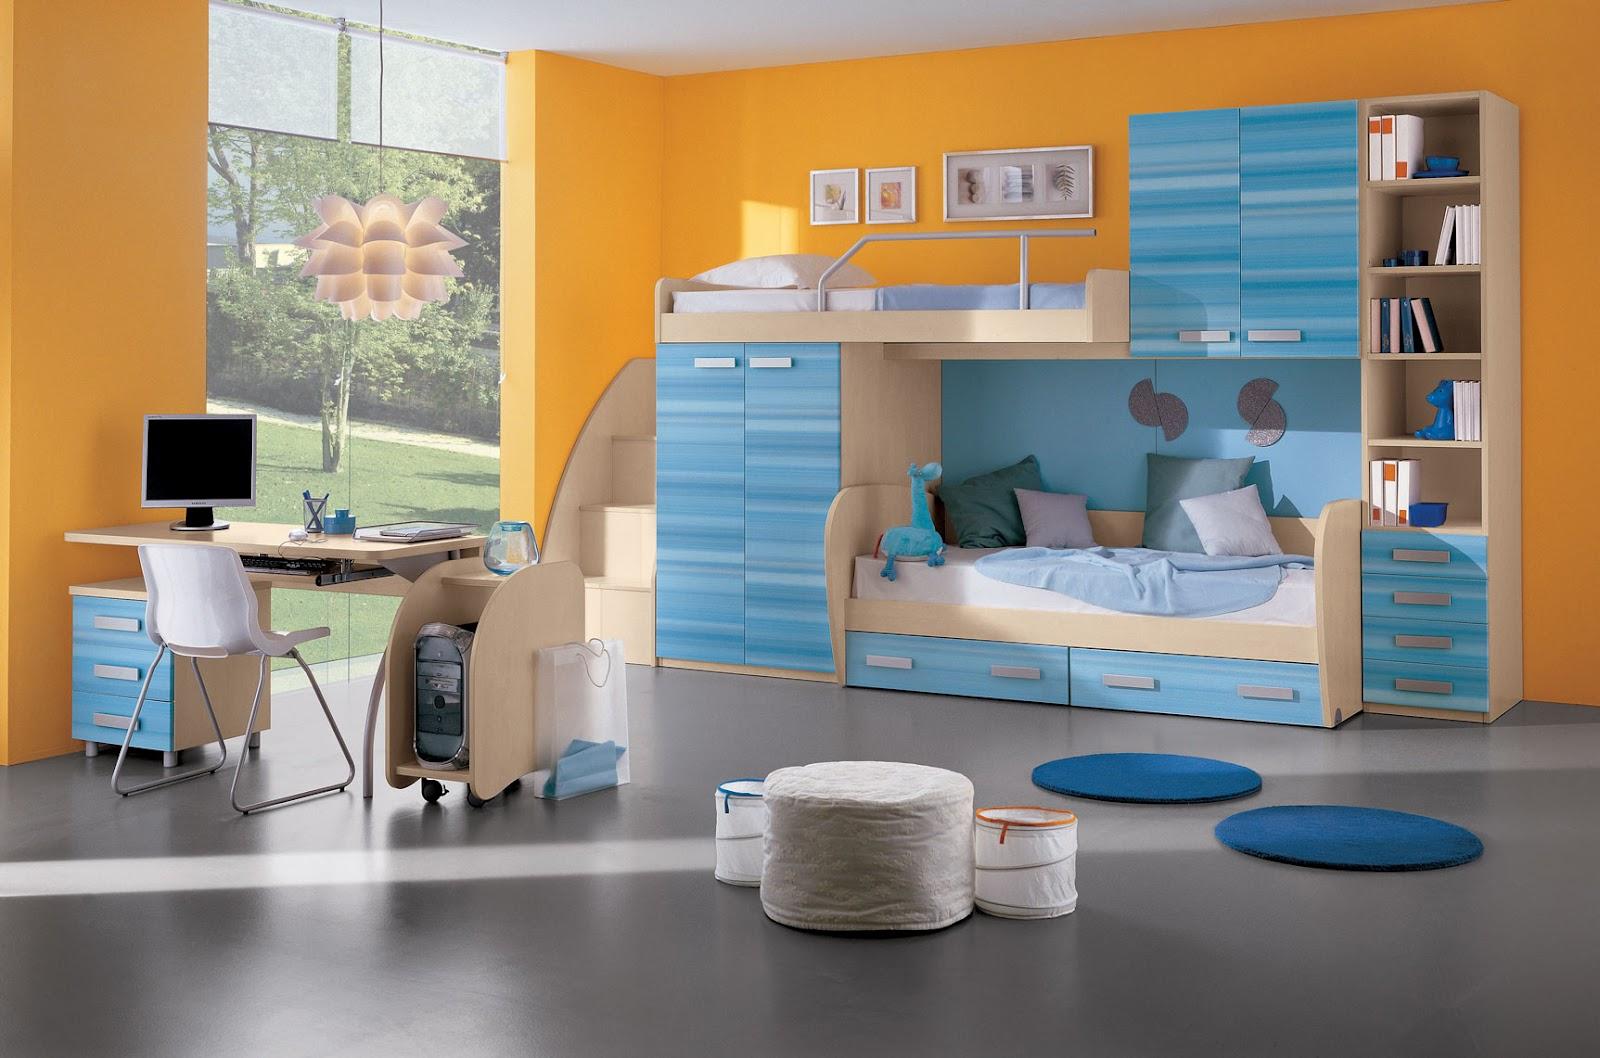 wallpaper: wallpaper ideas for kids room